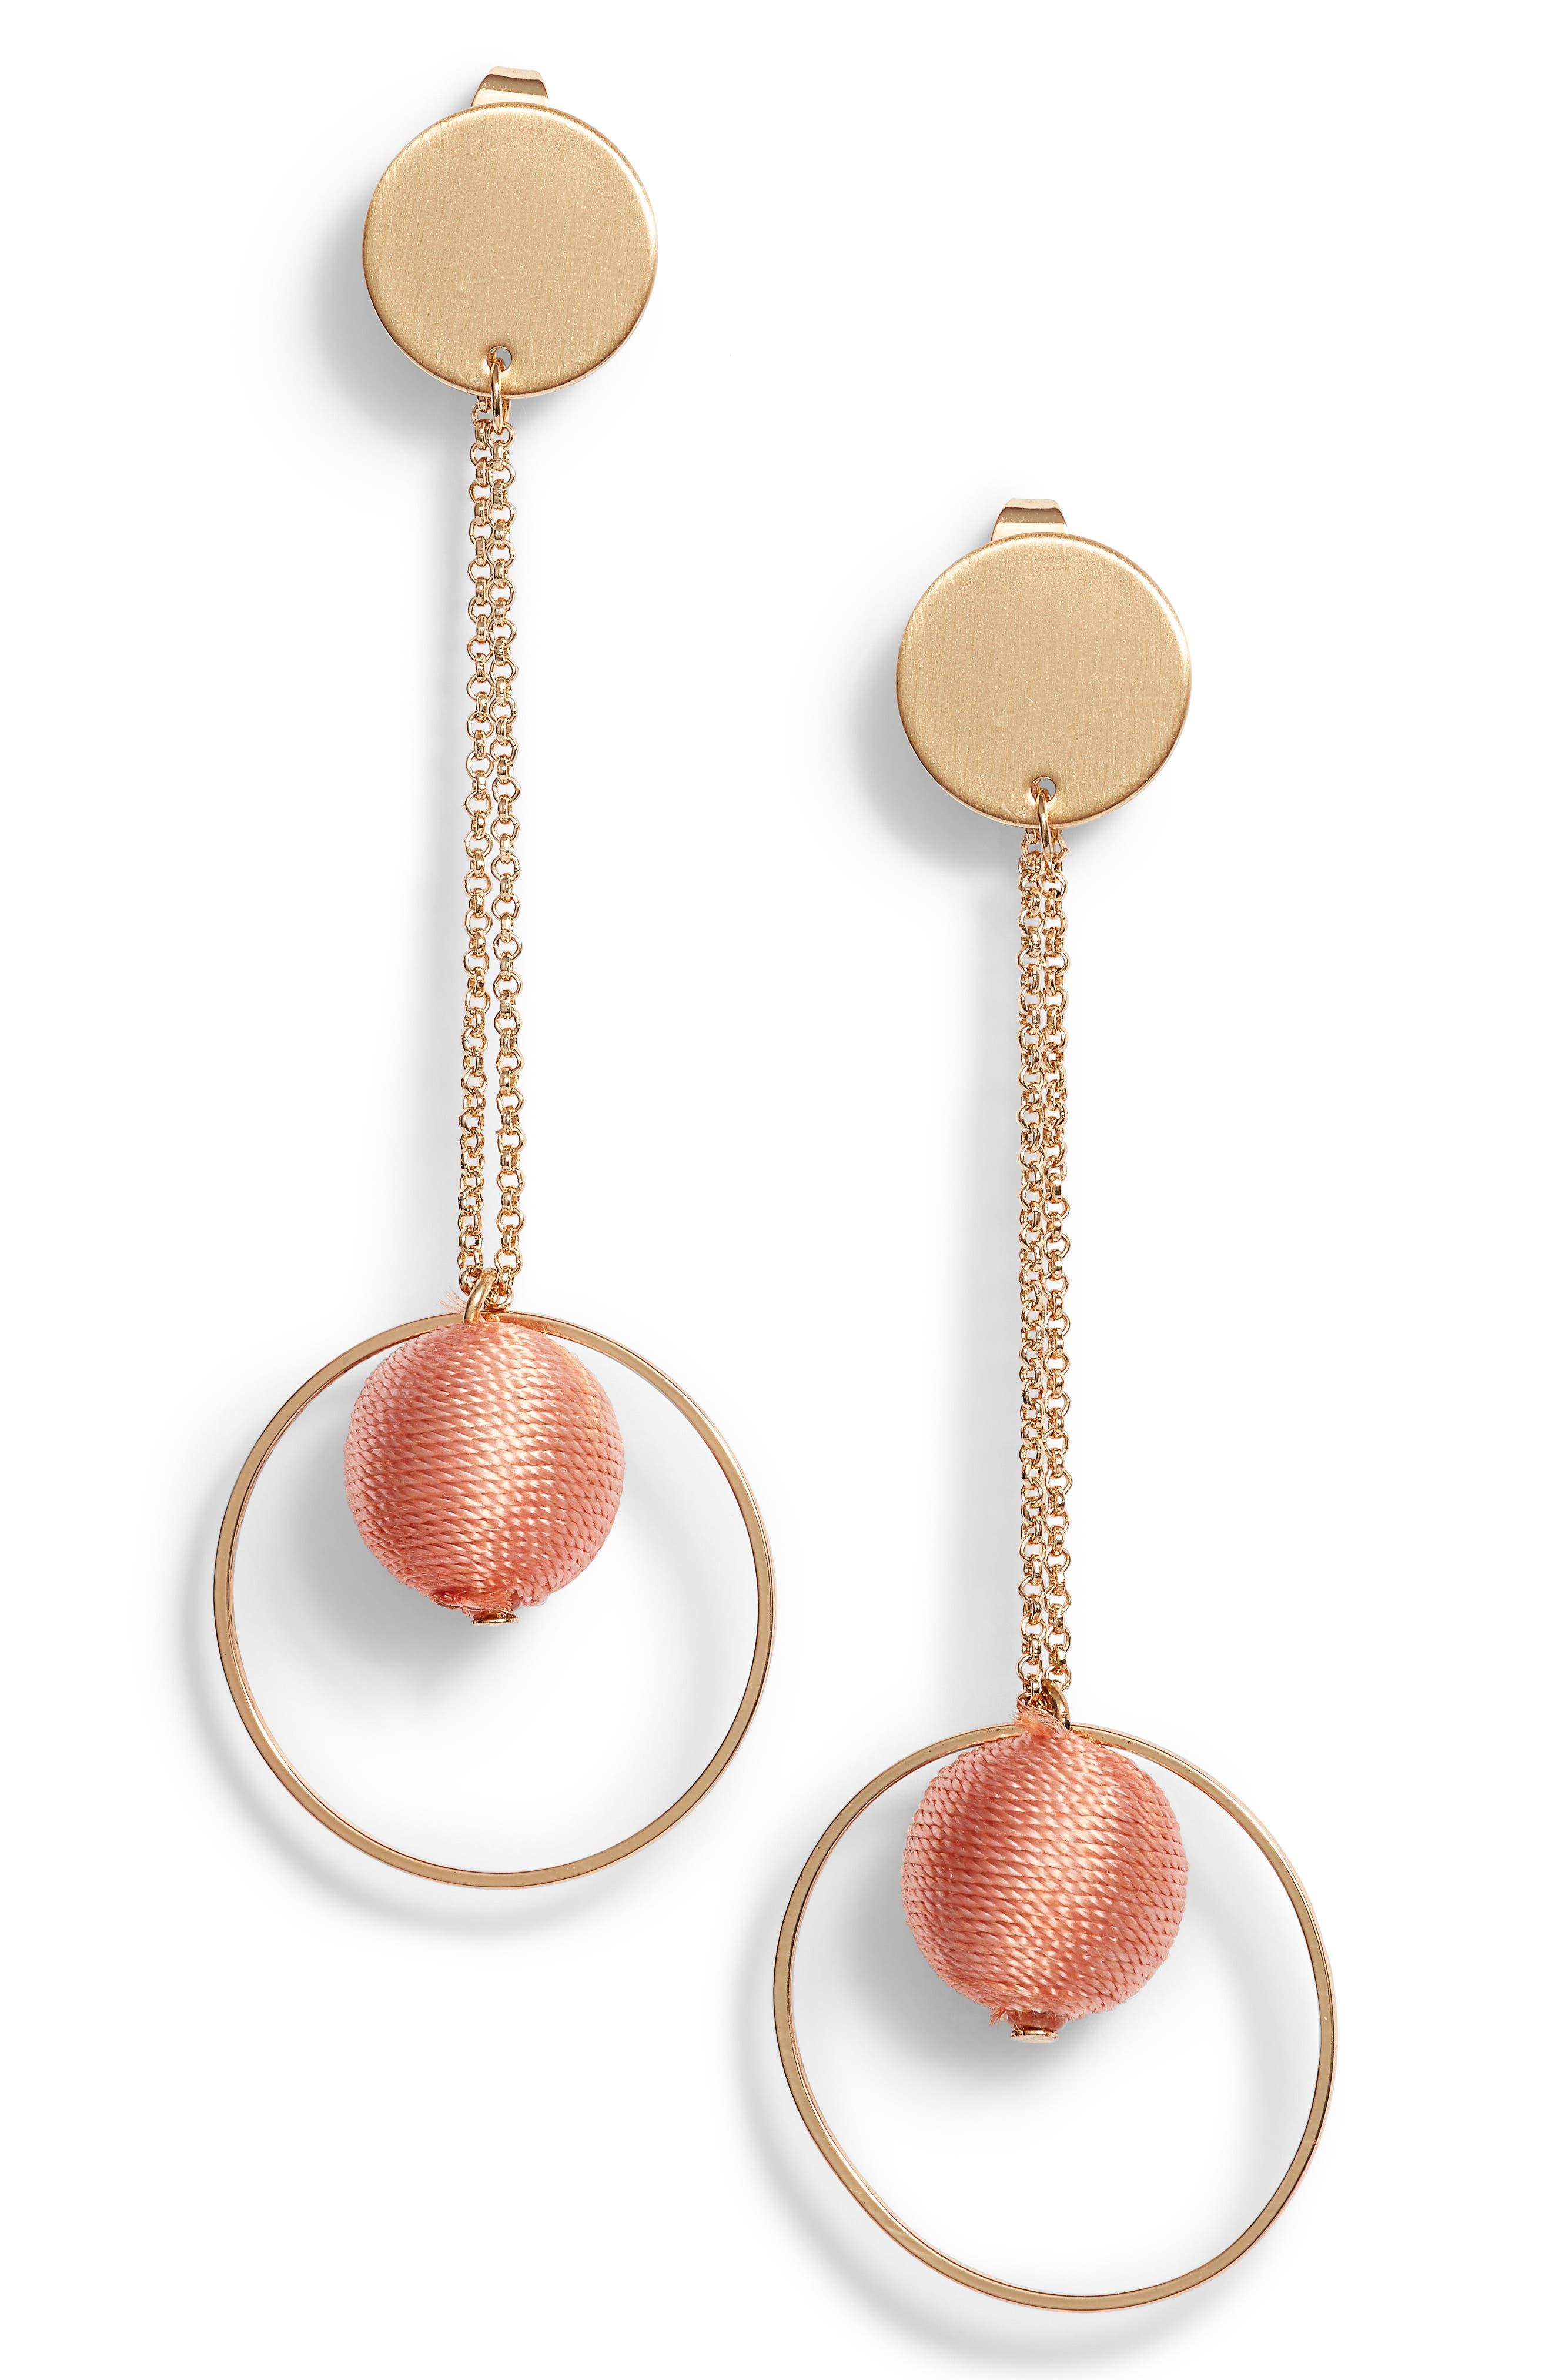 Main Image - Rebecca Minkoff Disc and Hoop Drop Earrings